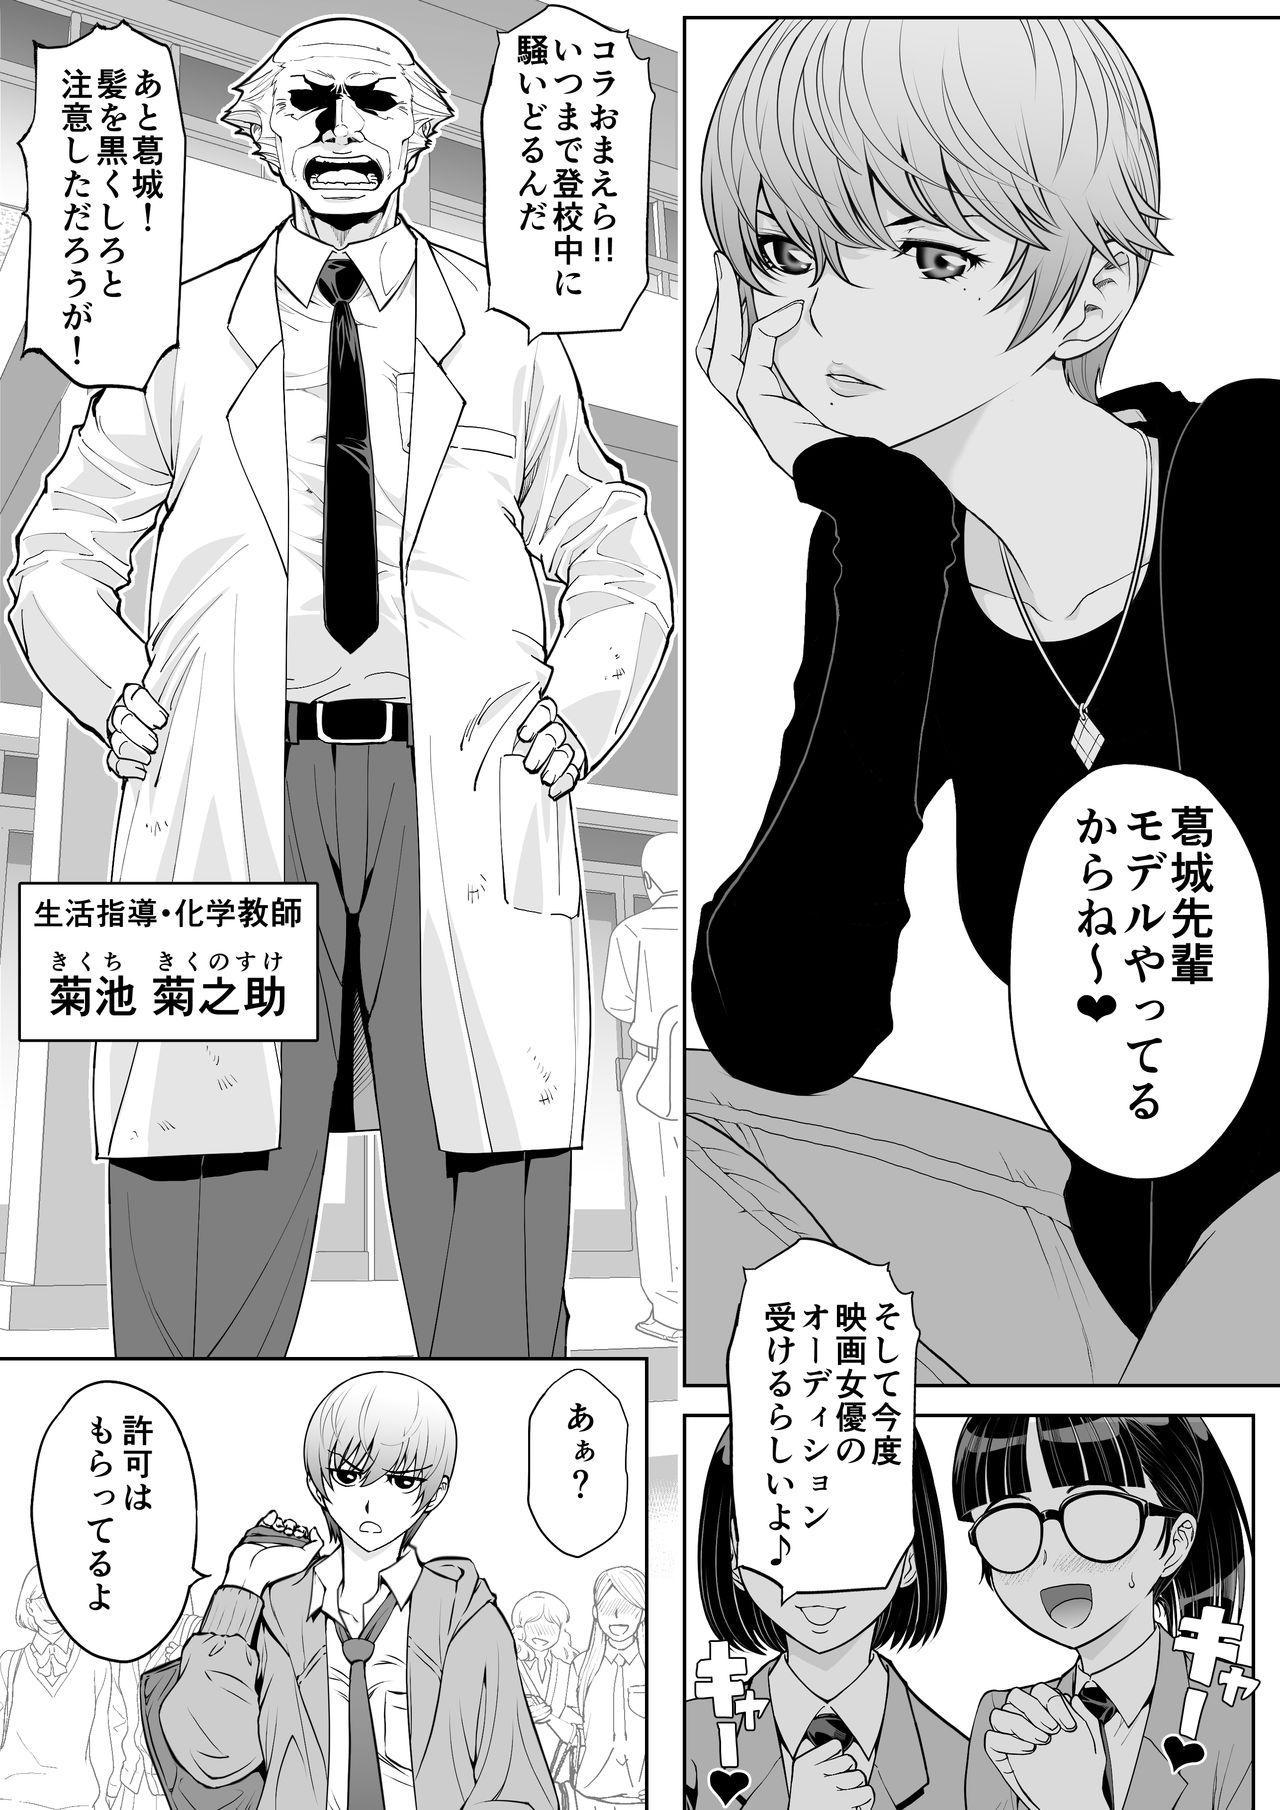 Namaiki mmusume ni tsuyo ● ikīki jugyō 4